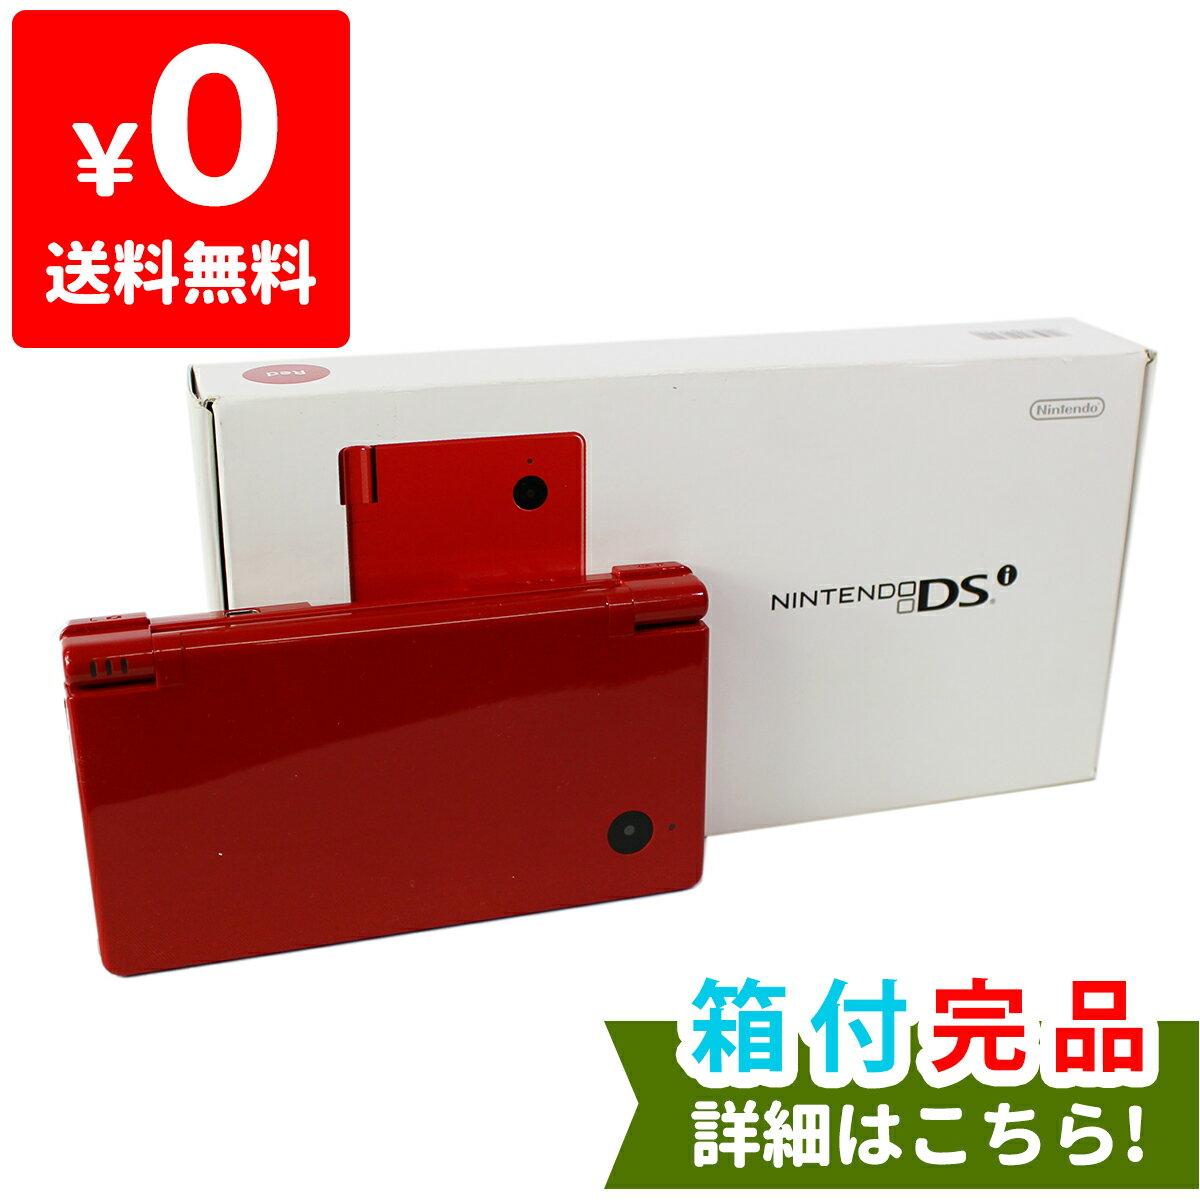 DSi ニンテンドーDSi レッドTWL-S-RA 本体 完品 外箱付き Nintendo 任天堂 ニンテンドー 中古 4902370517200 送料無料 【中古】